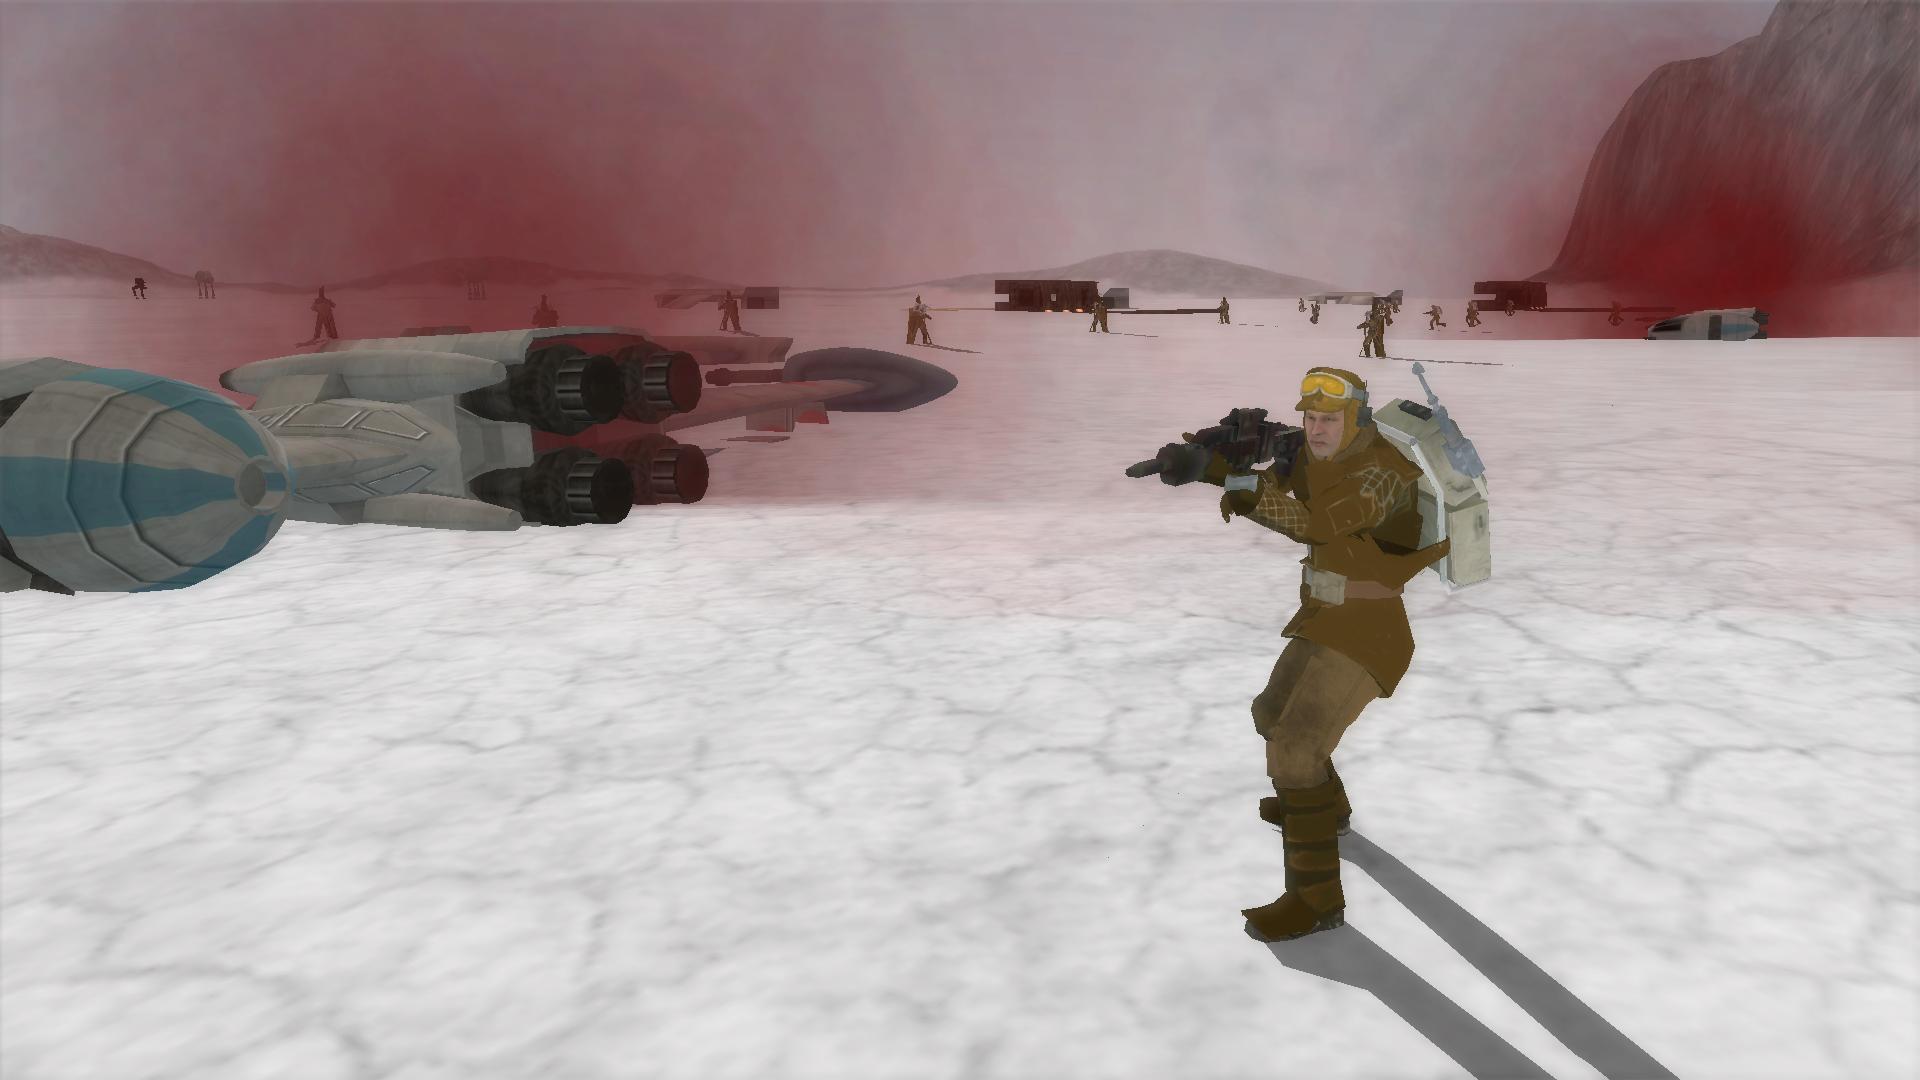 Crait Resistance Soldier Image Star Wars A New Frontier Mod For Star Wars Battlefront Ii Mod Db